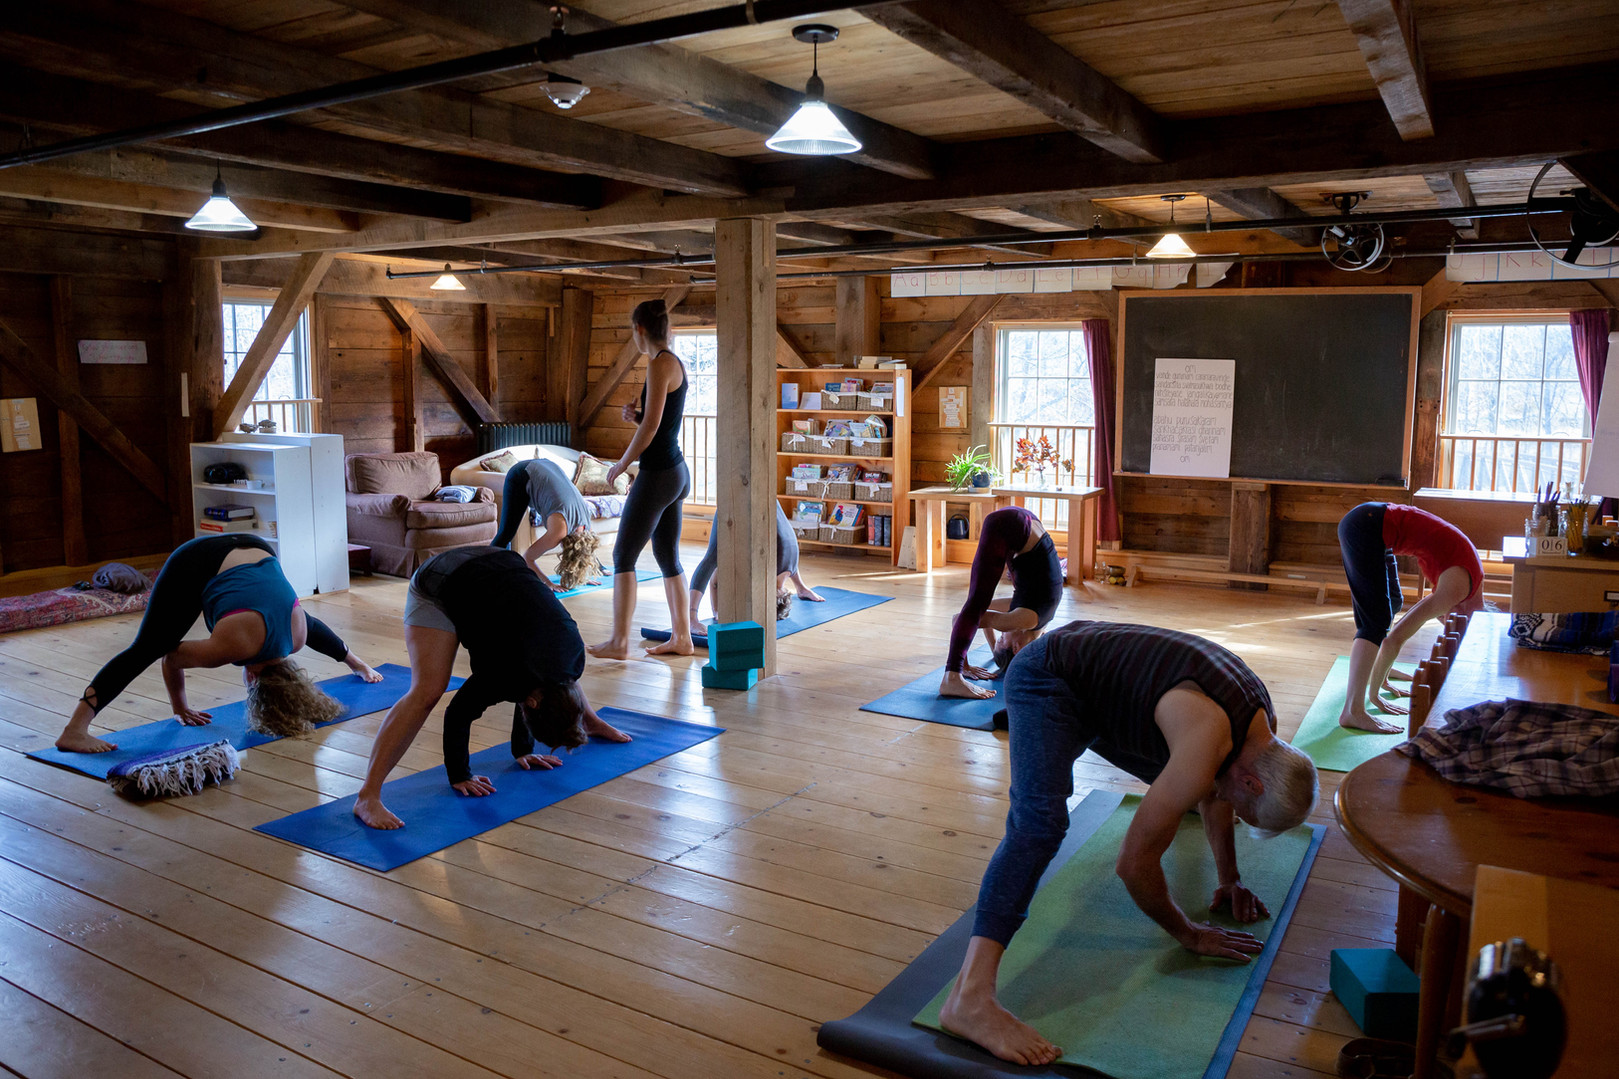 IMG_8900_OPIA_MoriahHelms_Yoga.jpg